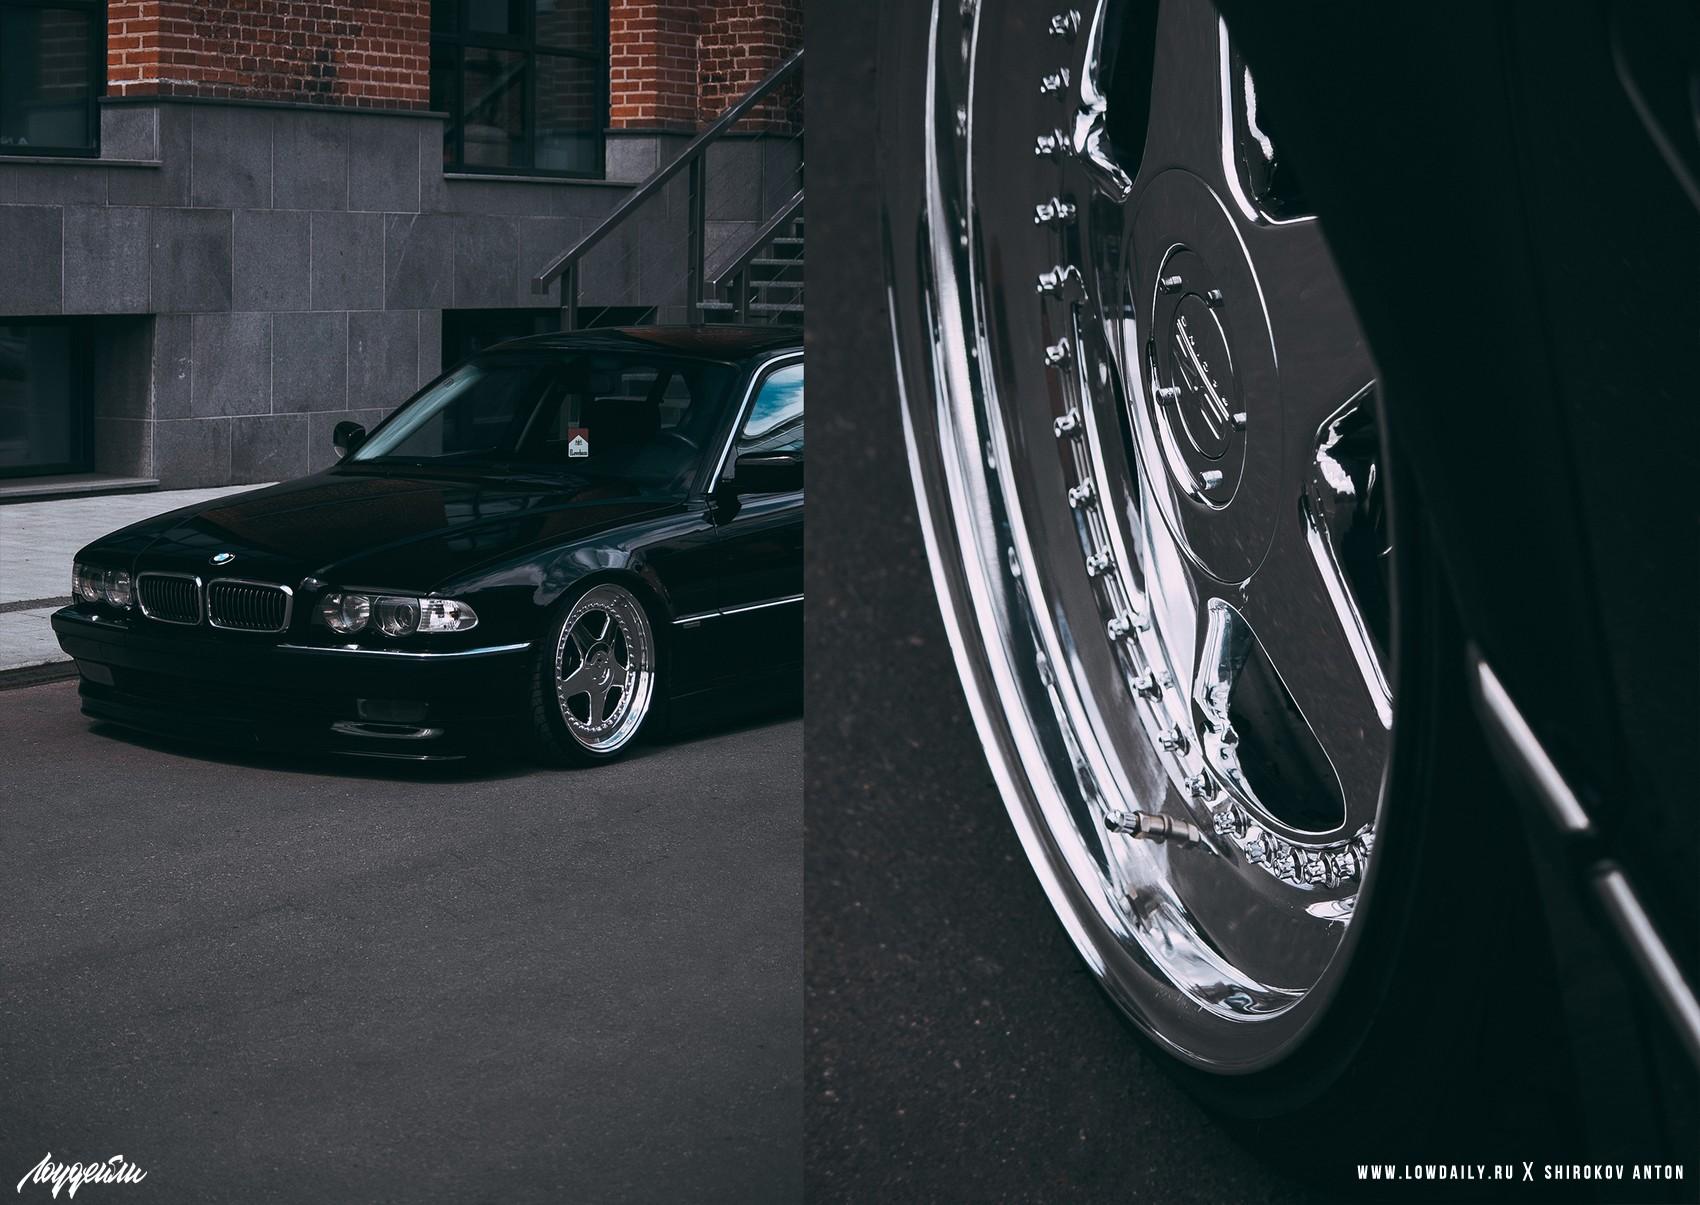 BMW E38 Lowdaily _MG_7096_12ddsa